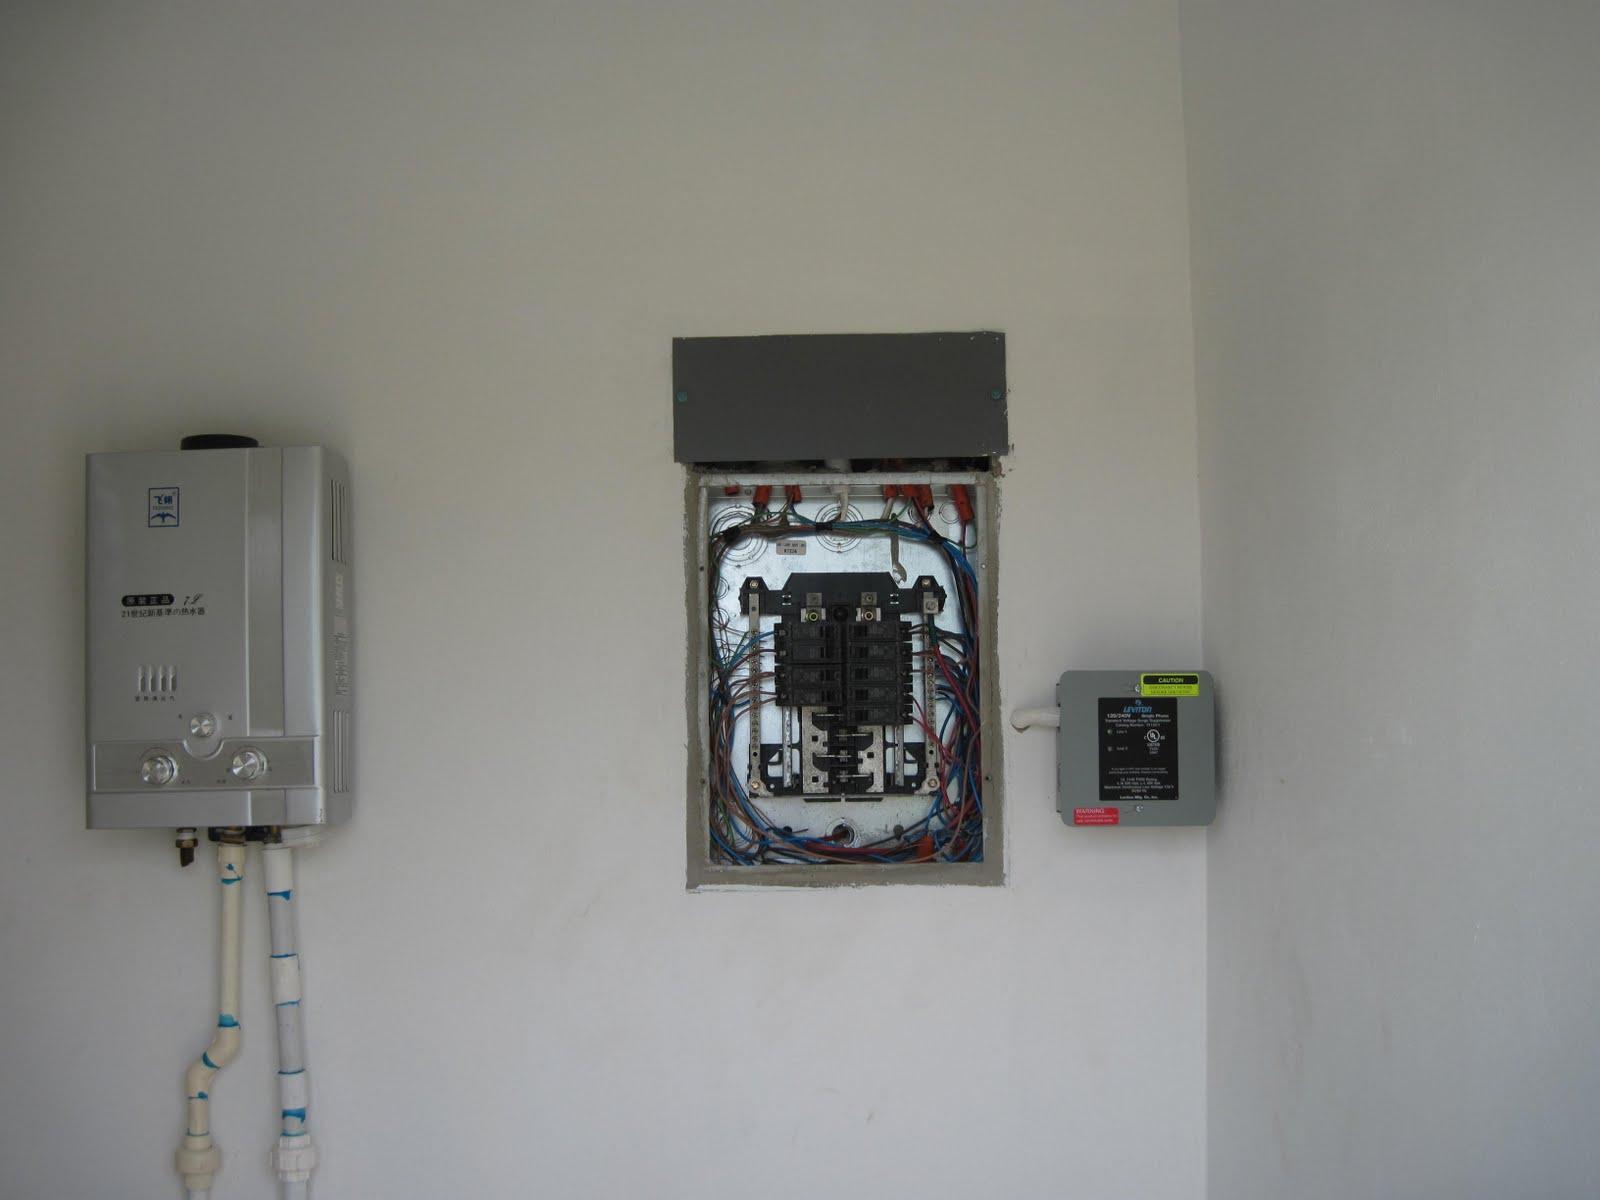 Water Heater, Breaker Box Whole House Surge Suppressor - Home Design